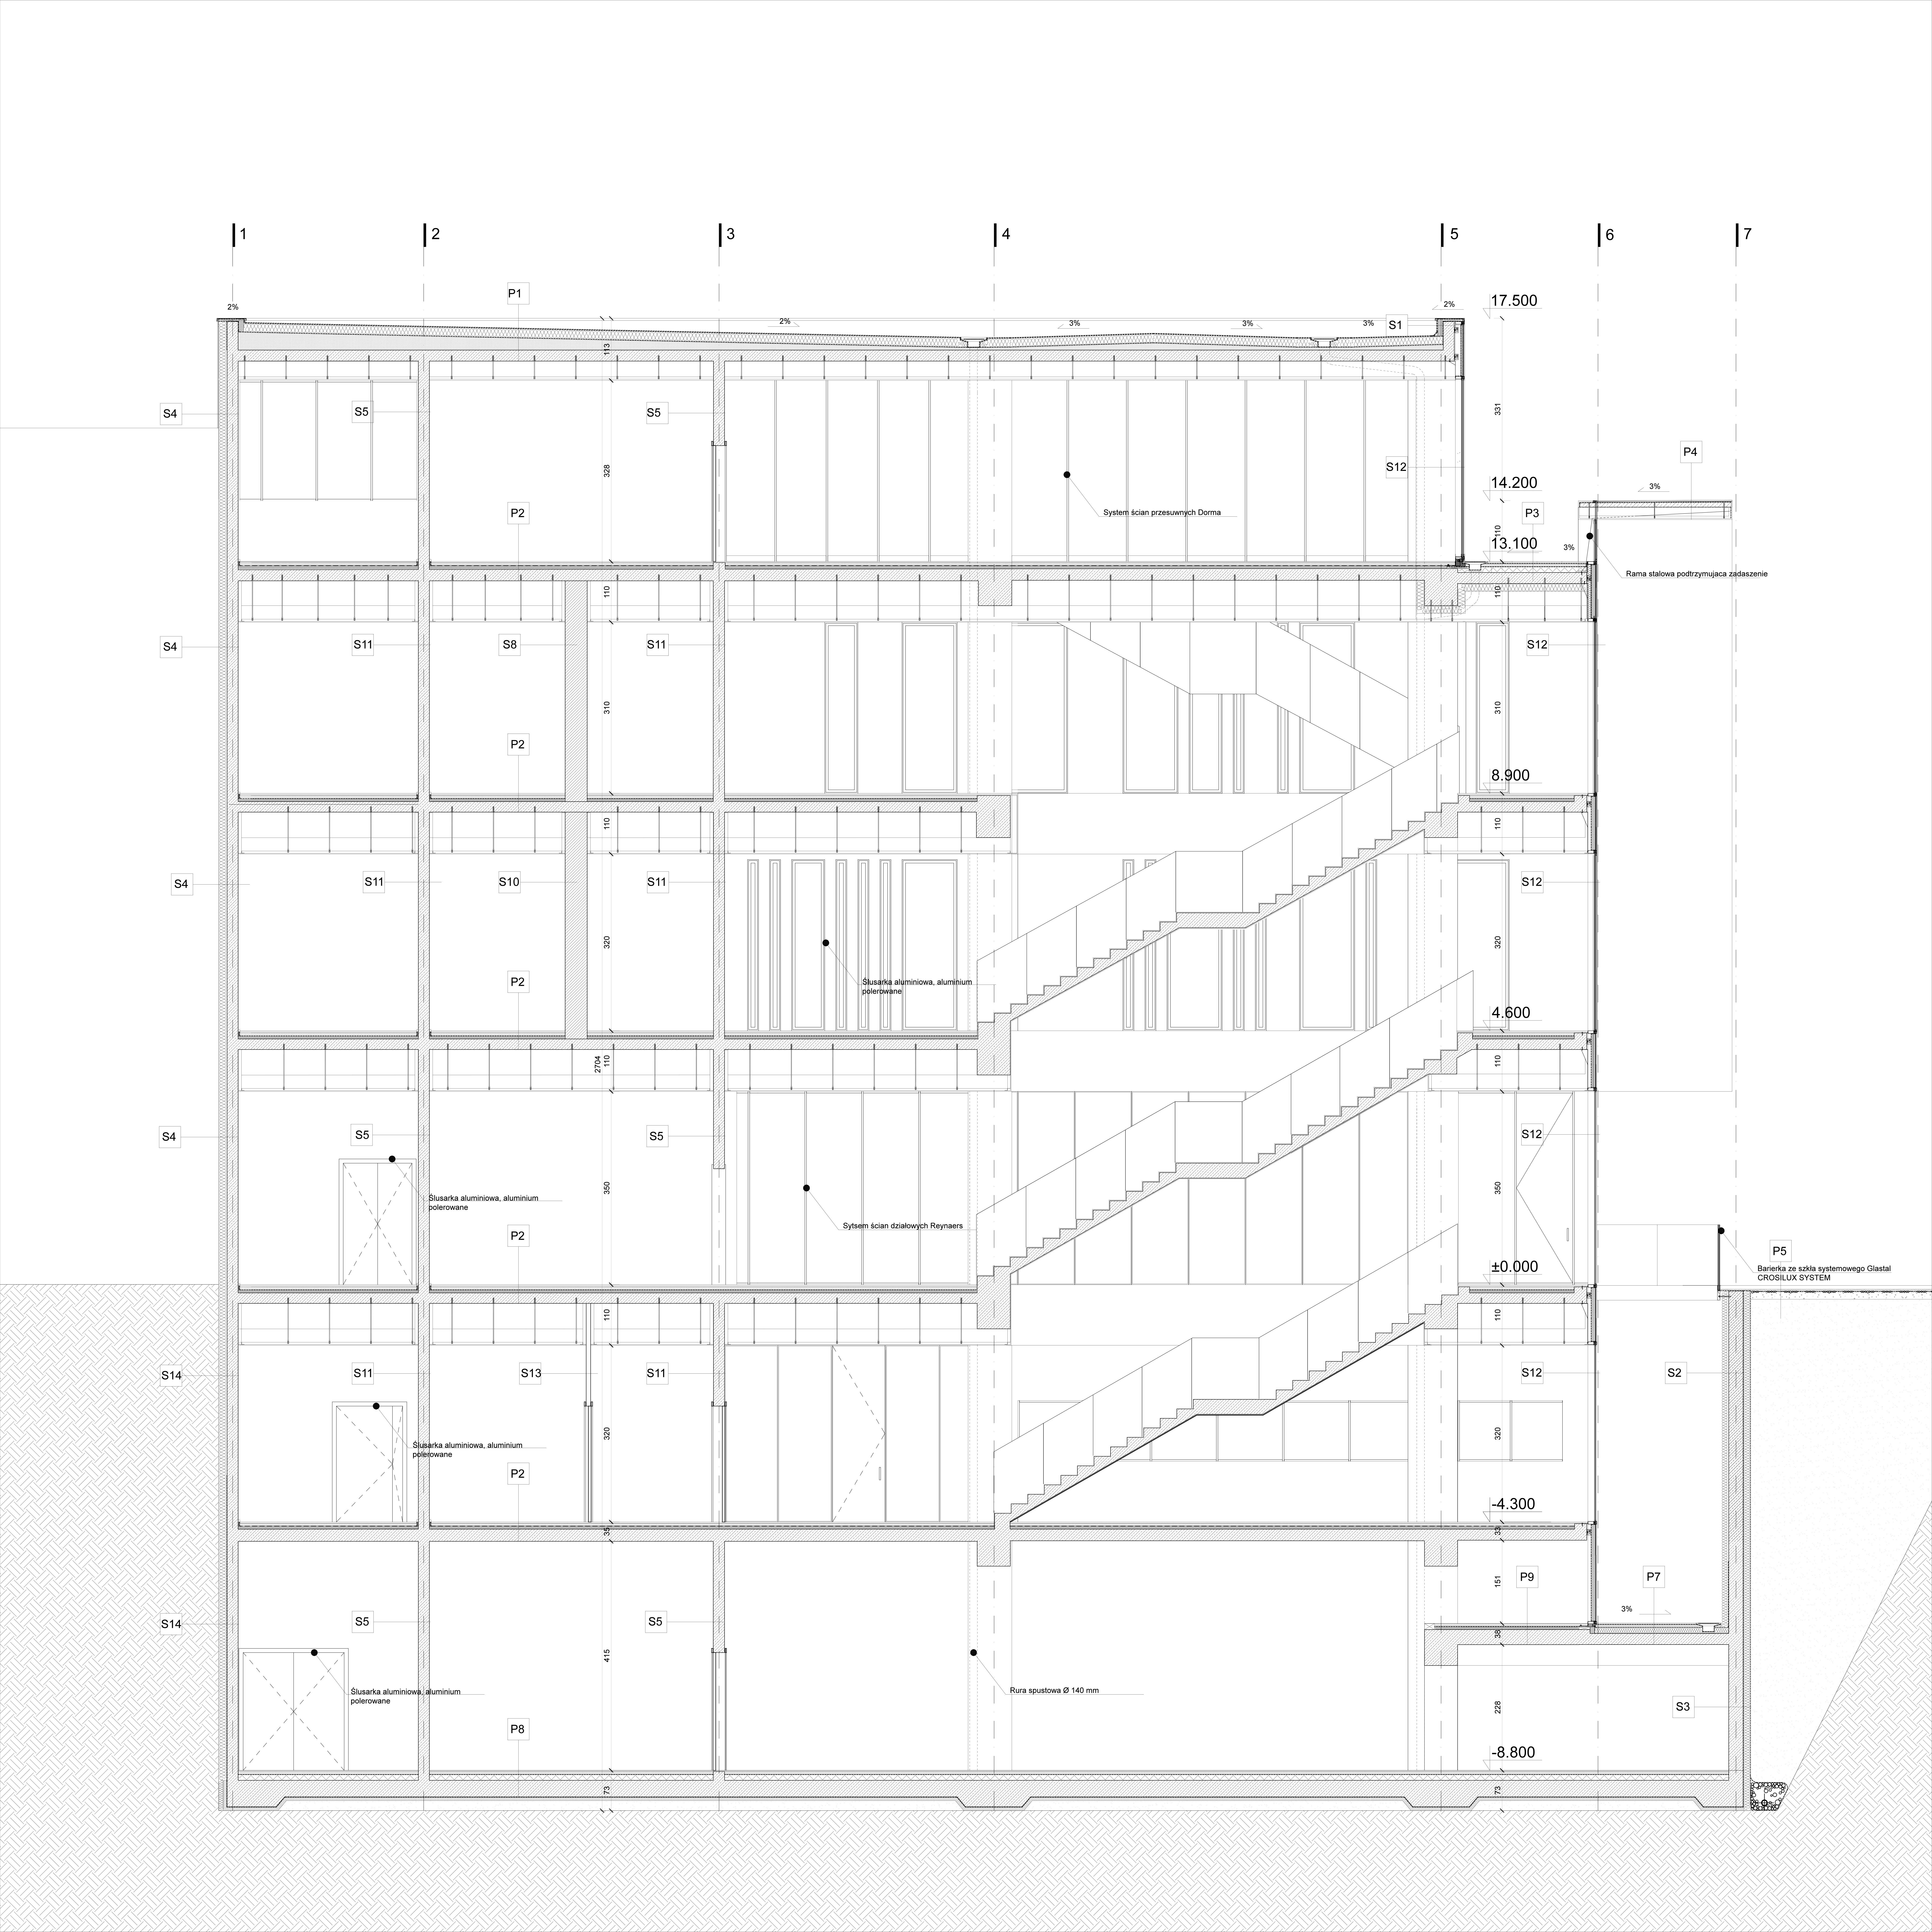 /Users/Sonia/Documents/Studia/Rok IV/Inżynierka/Cad/01.02/Media